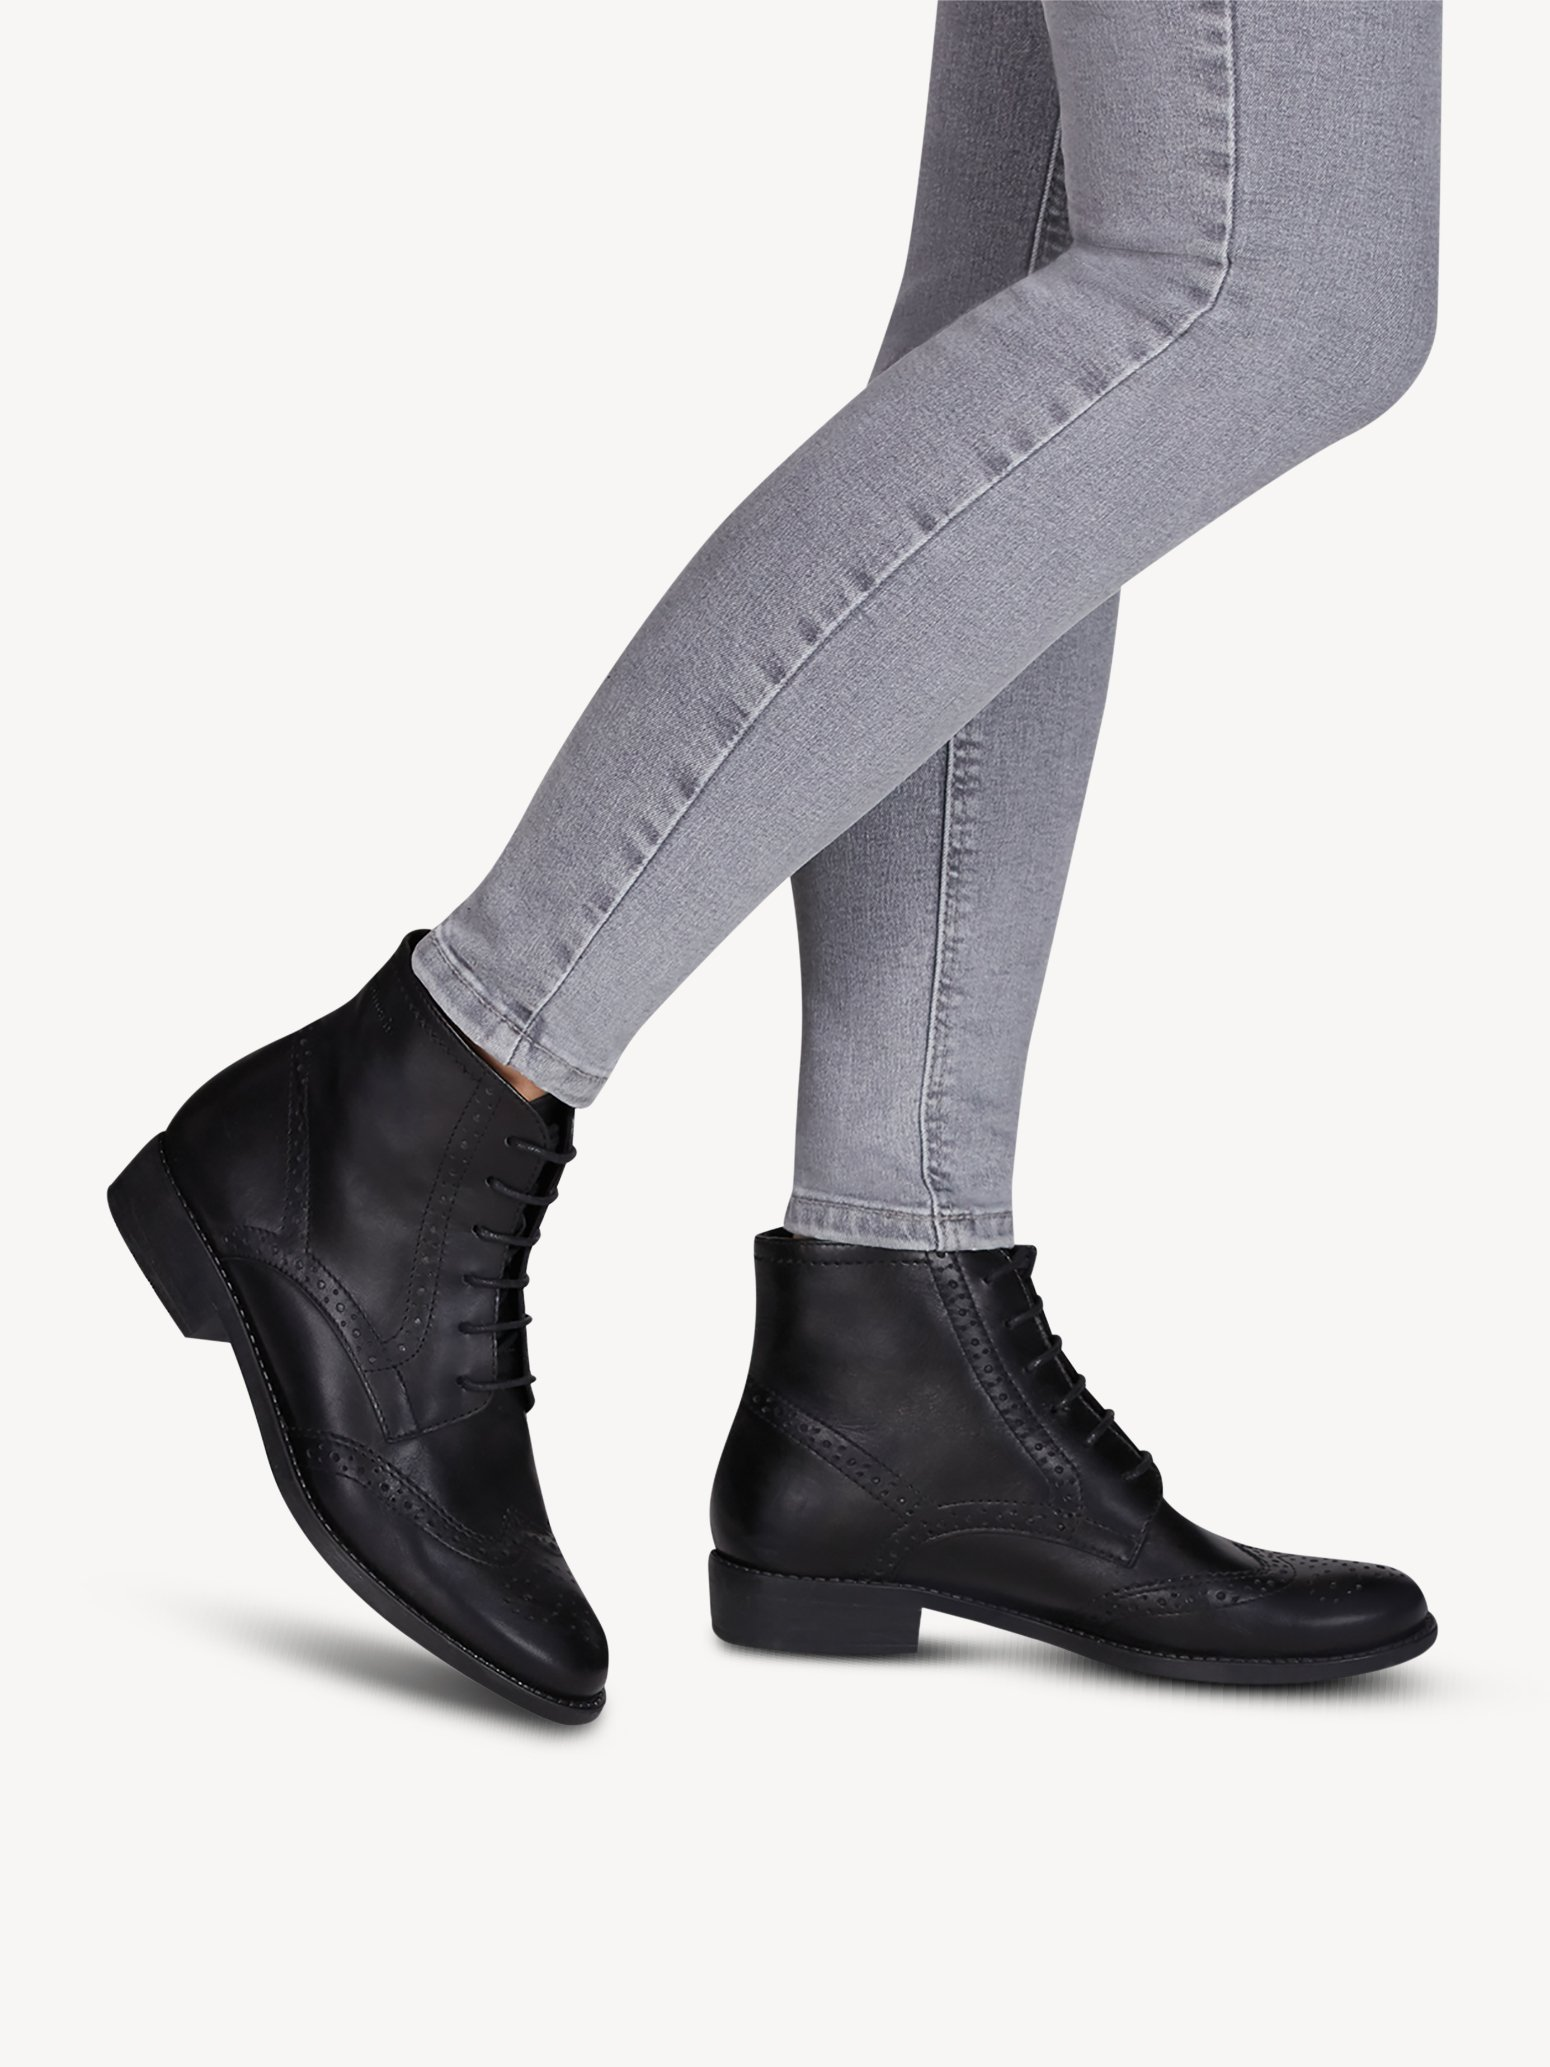 Ботинки Tamaris 1-1-25126-25-001